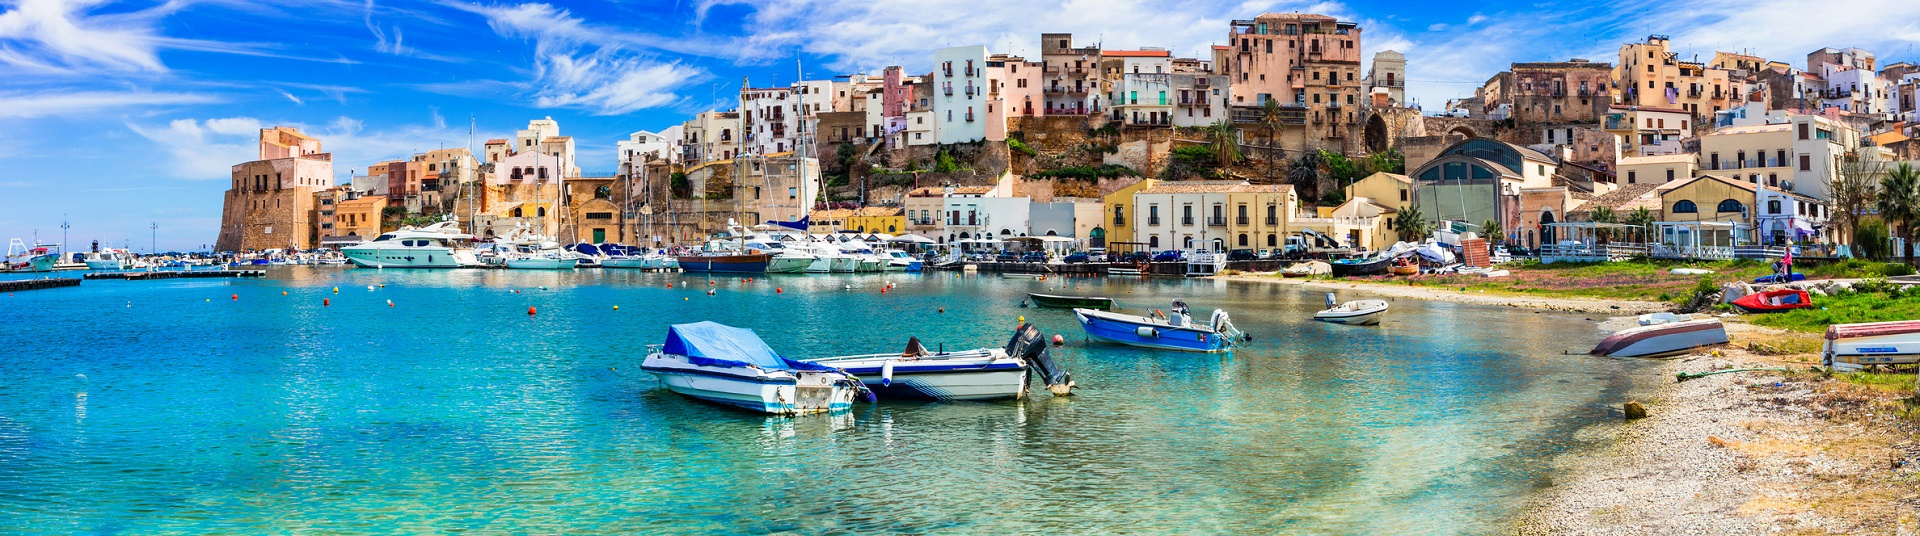 Week-end pas cher Sicile